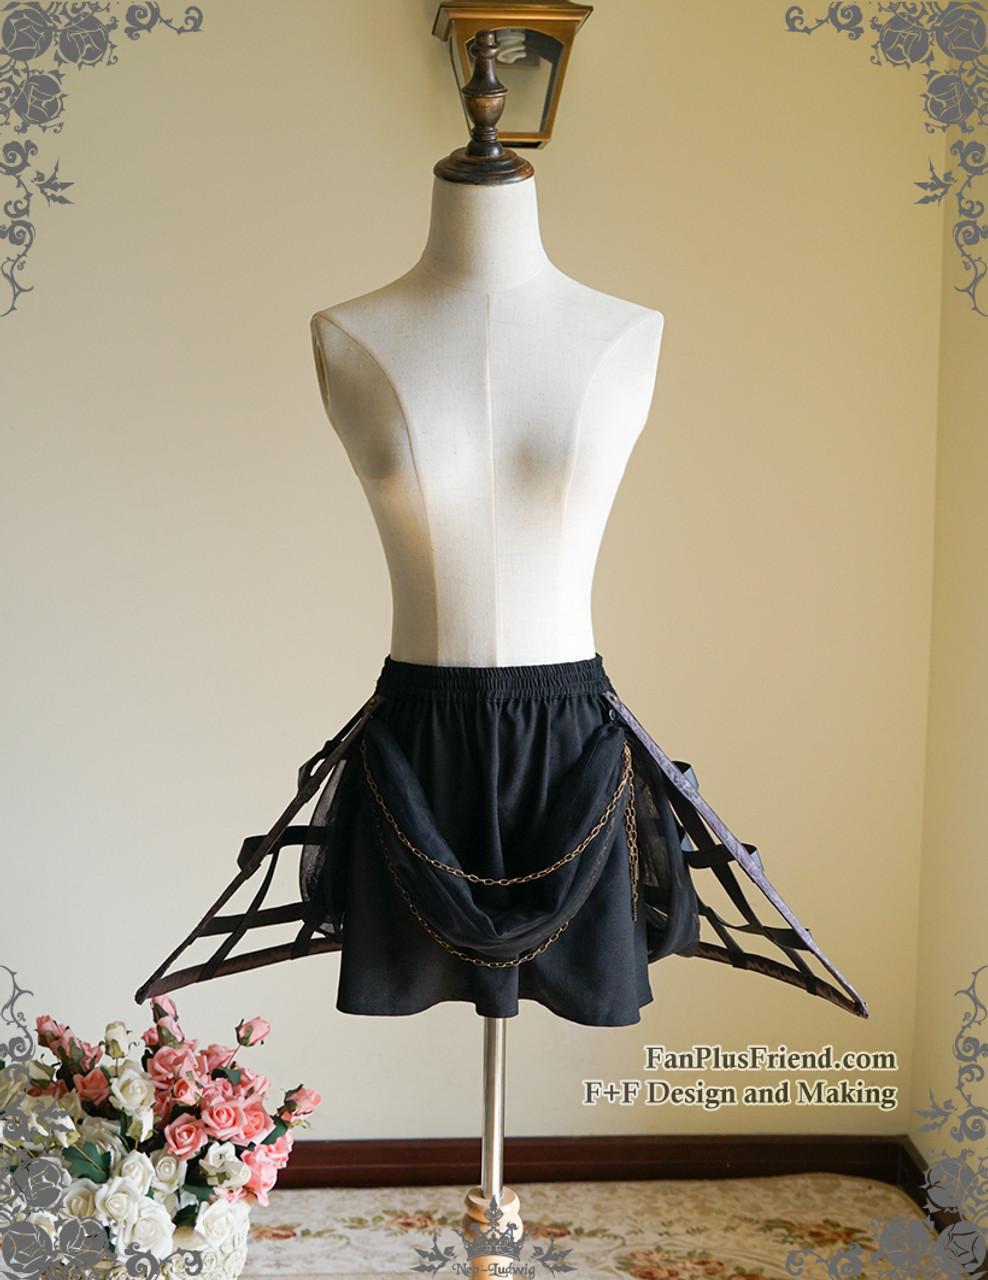 73595a581 Steampunk Crinoline Petticoat Short Cage Skirt Hoop Skirt Black White